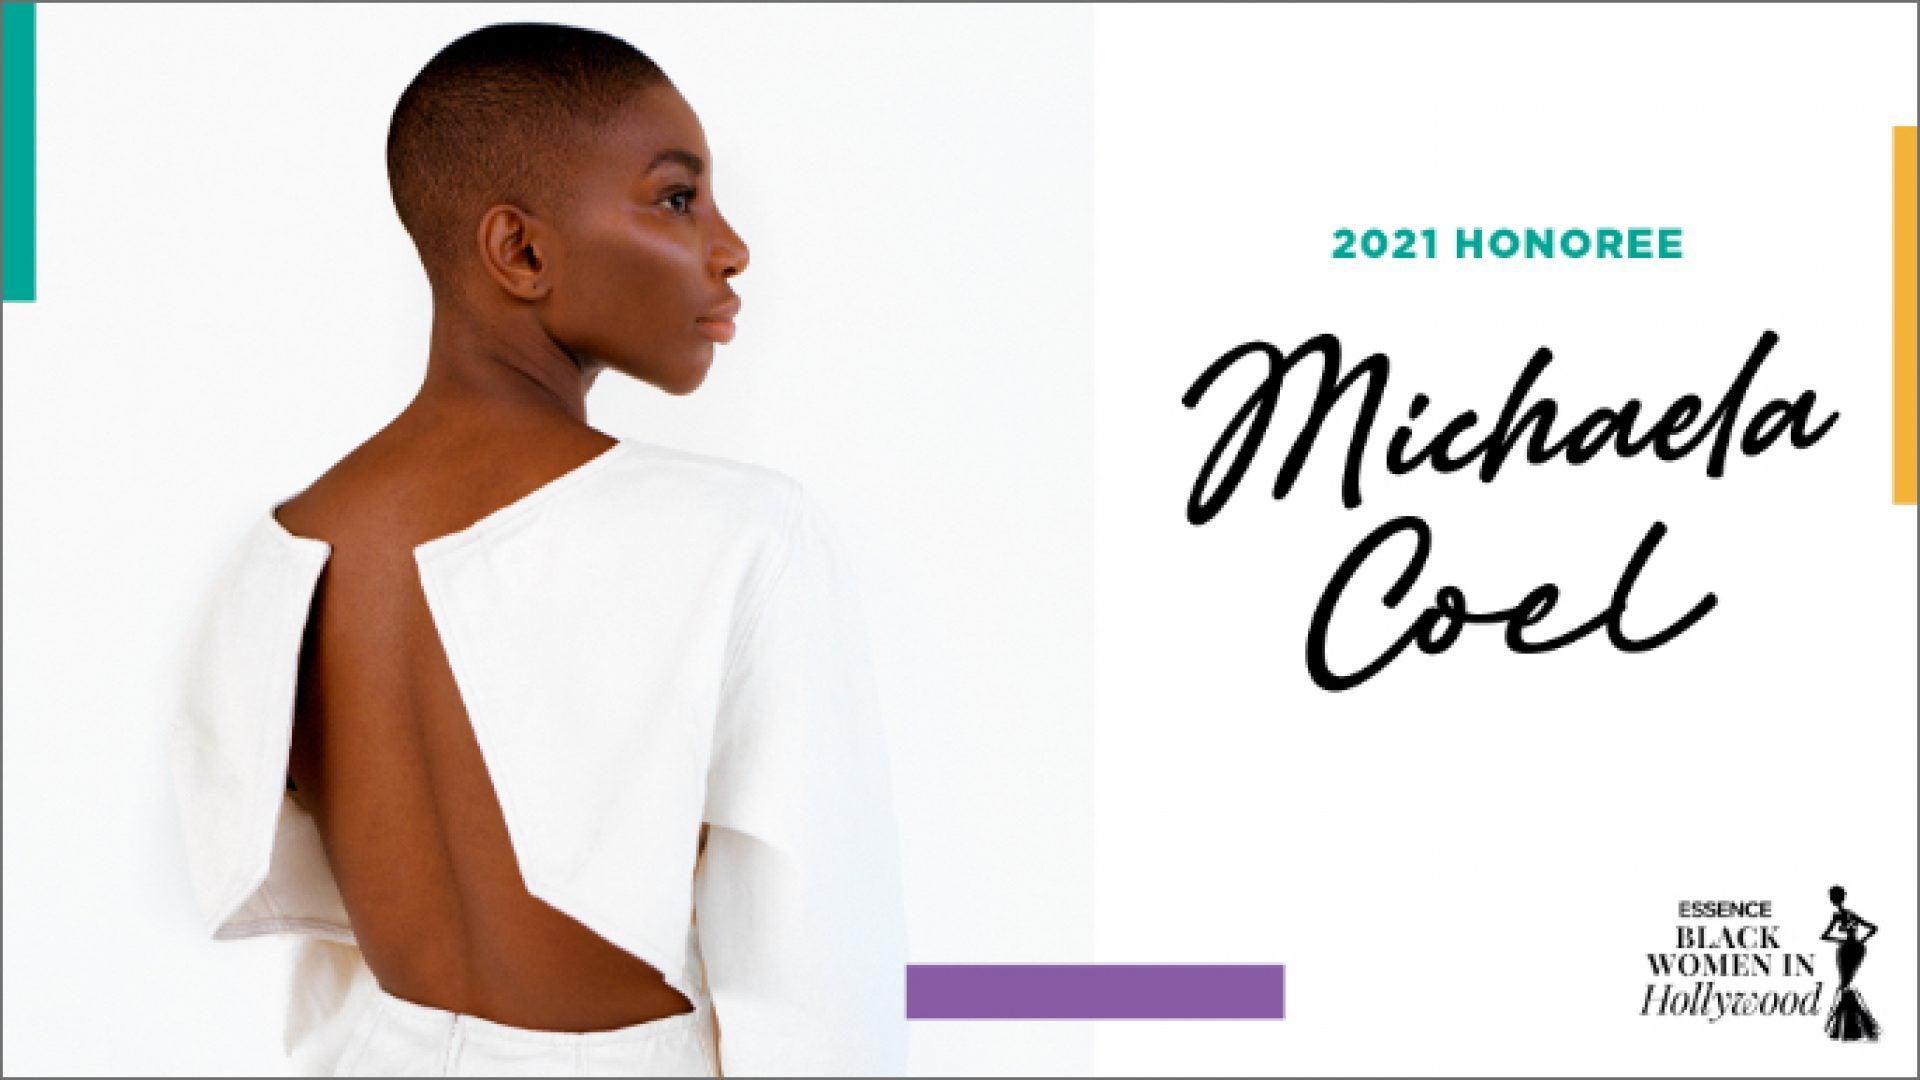 Michaela Coel